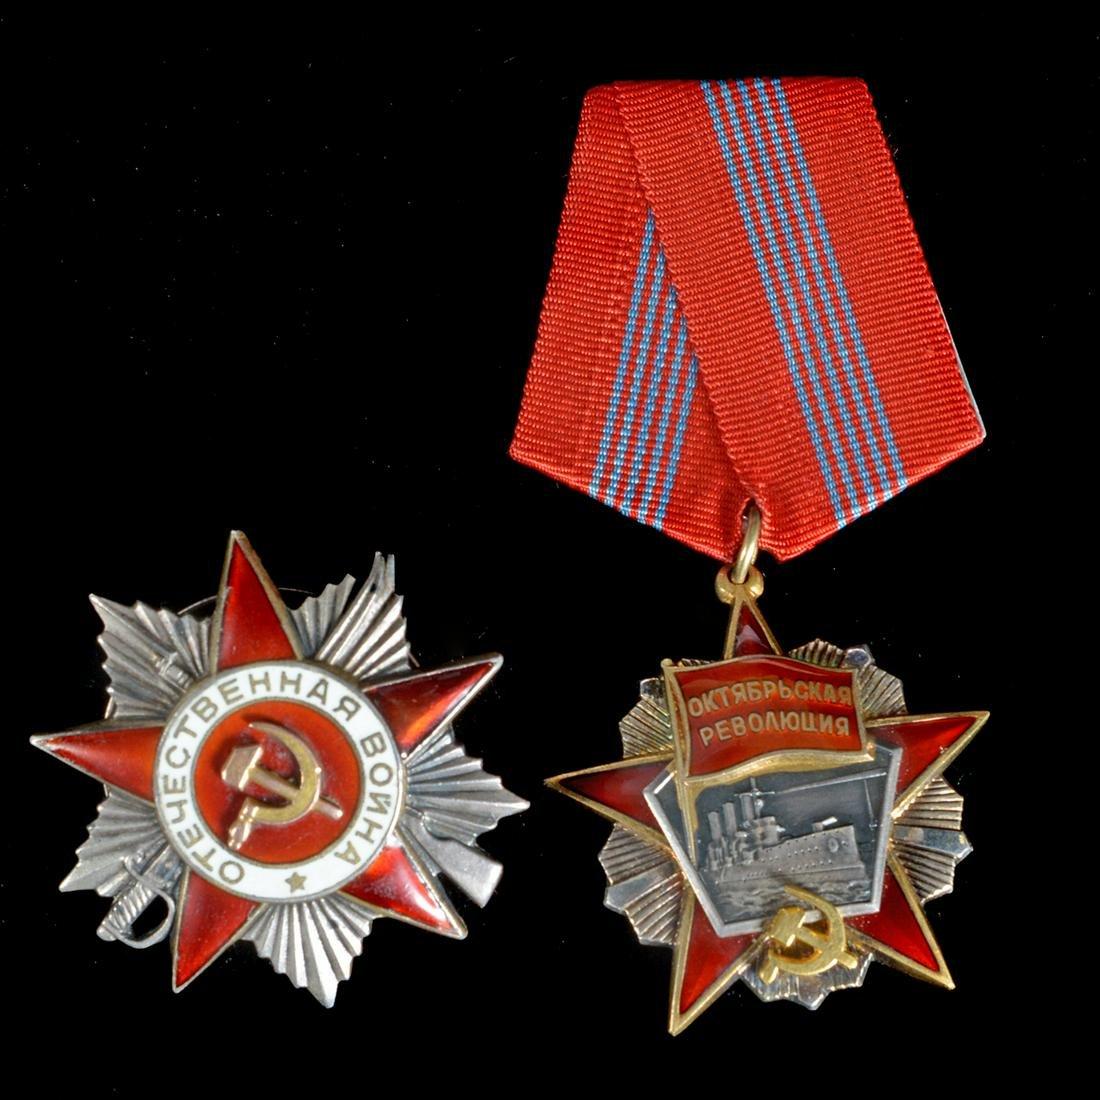 Lot of Two Russian Orders of Patriotic War